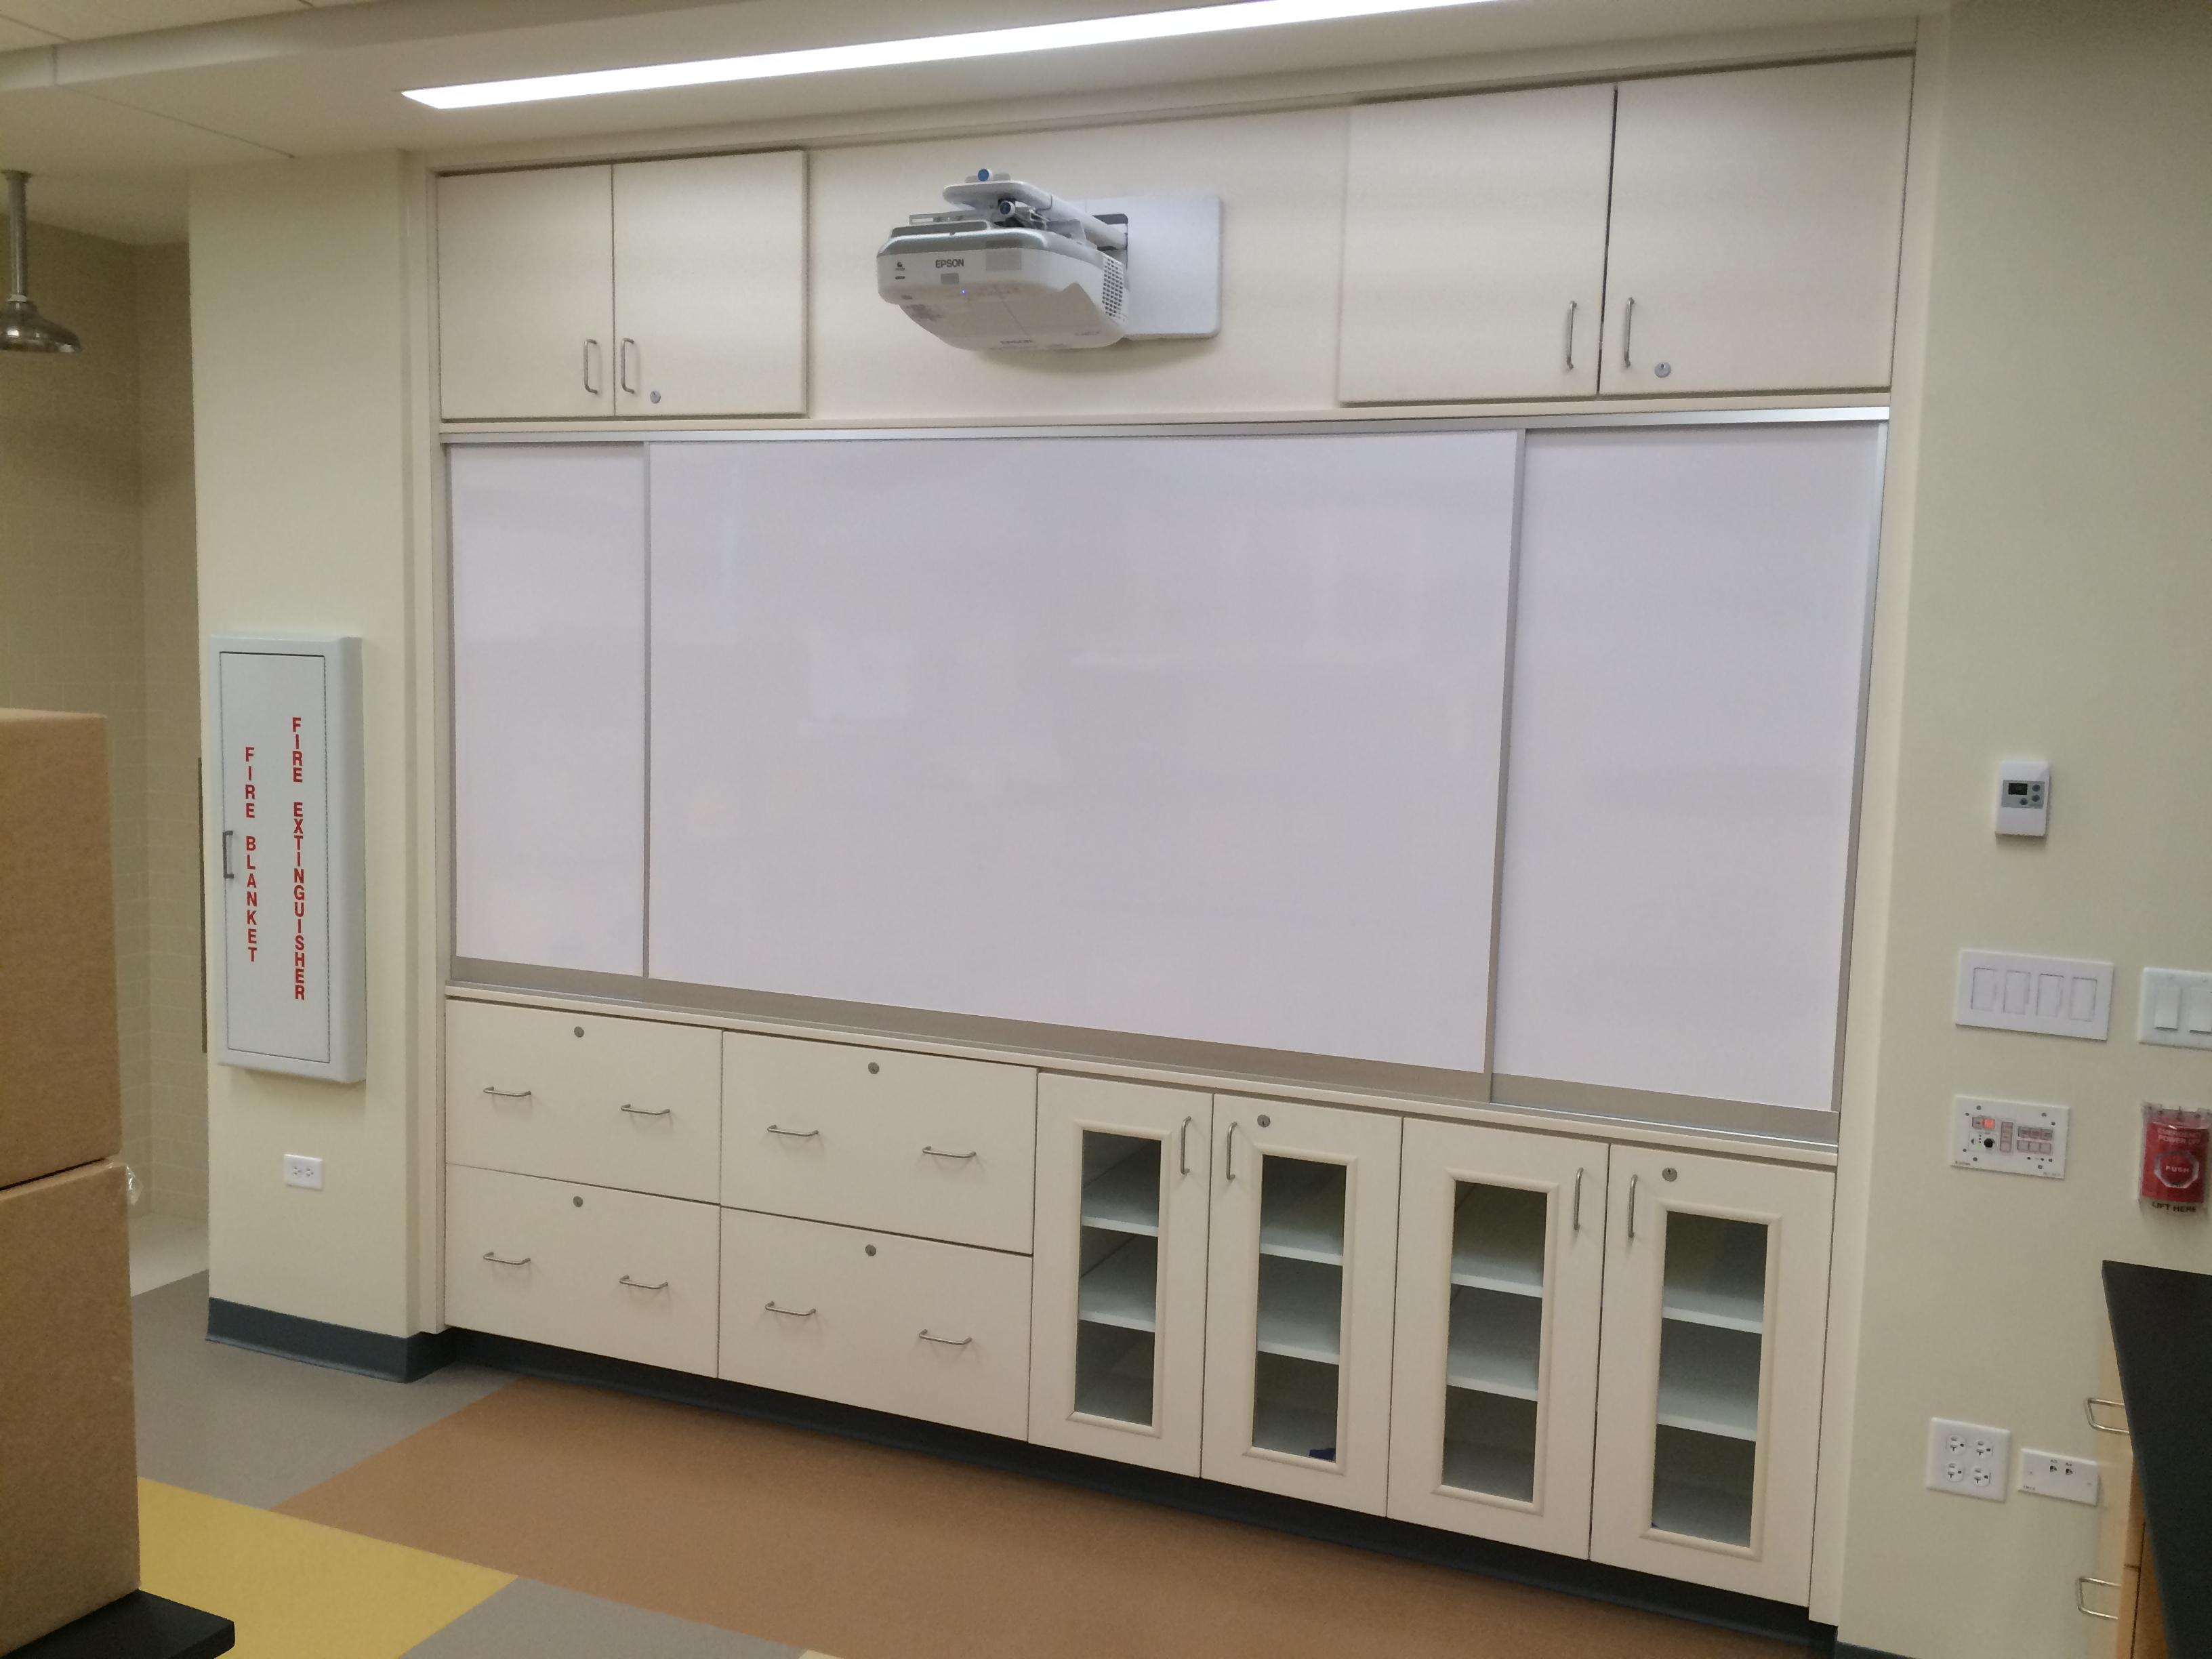 ACS Learning Wall 3